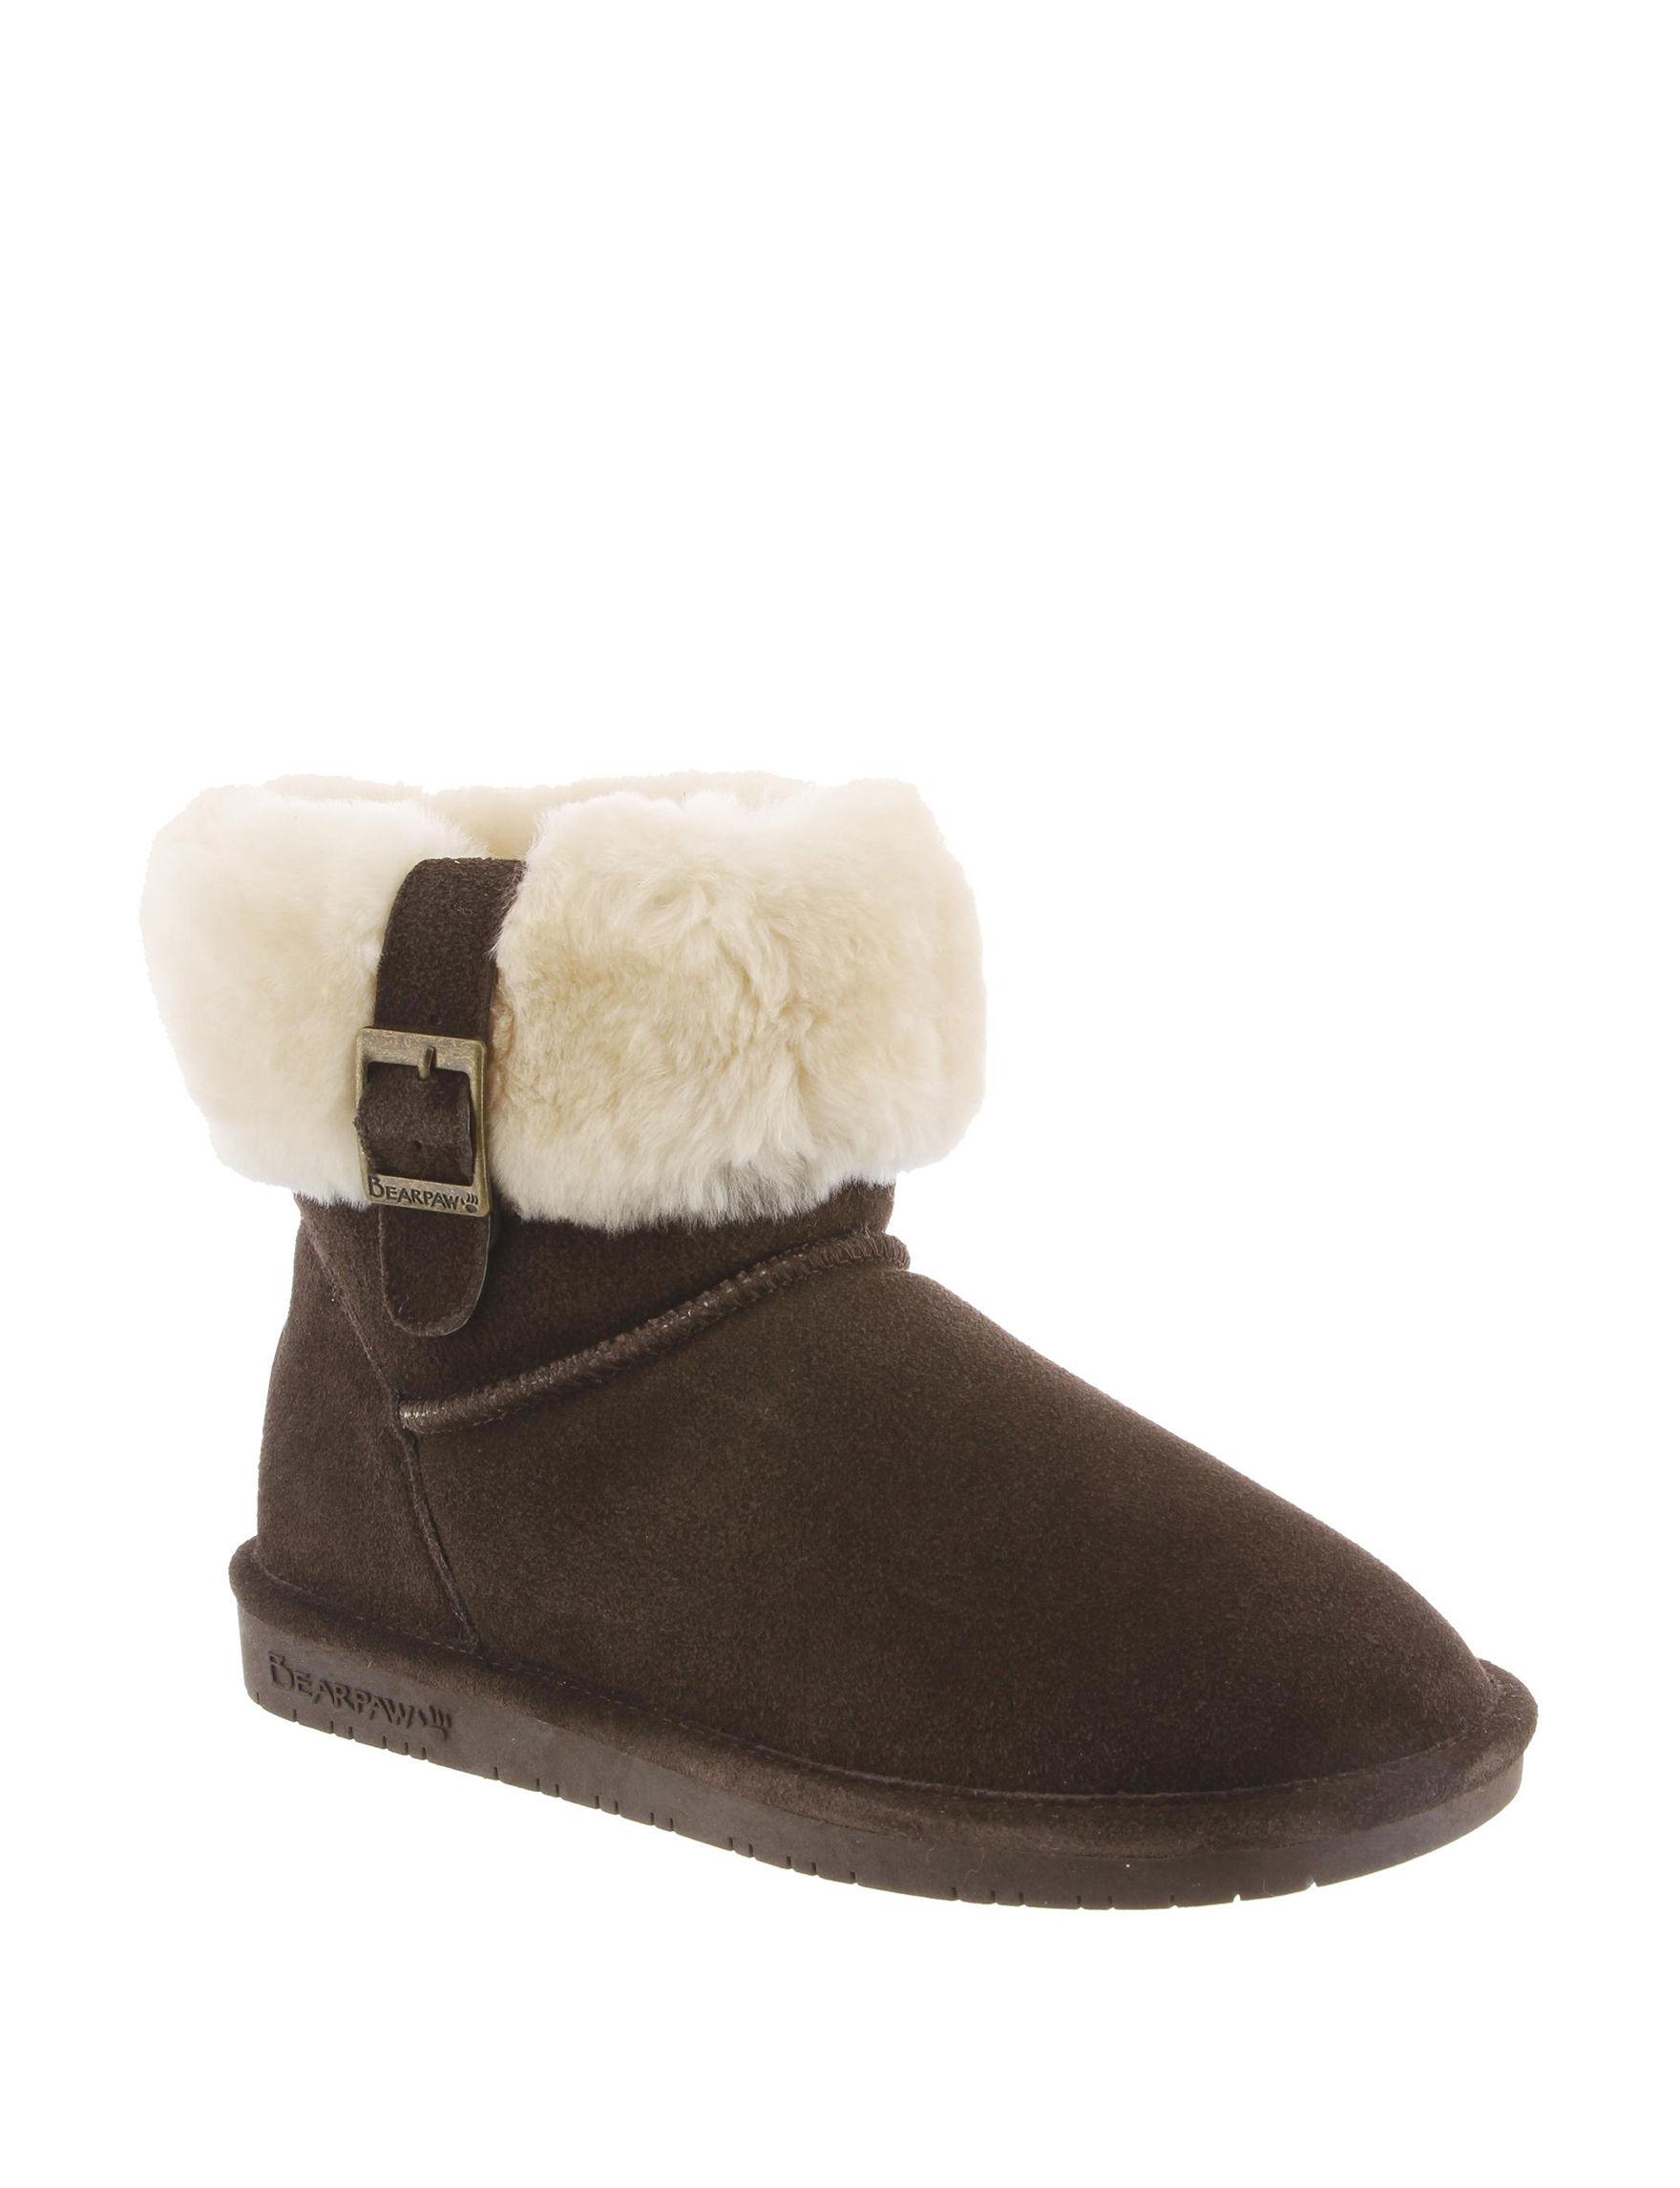 Bearpaw Dark Brown Ankle Boots & Booties Comfort Shoes Winter Boots